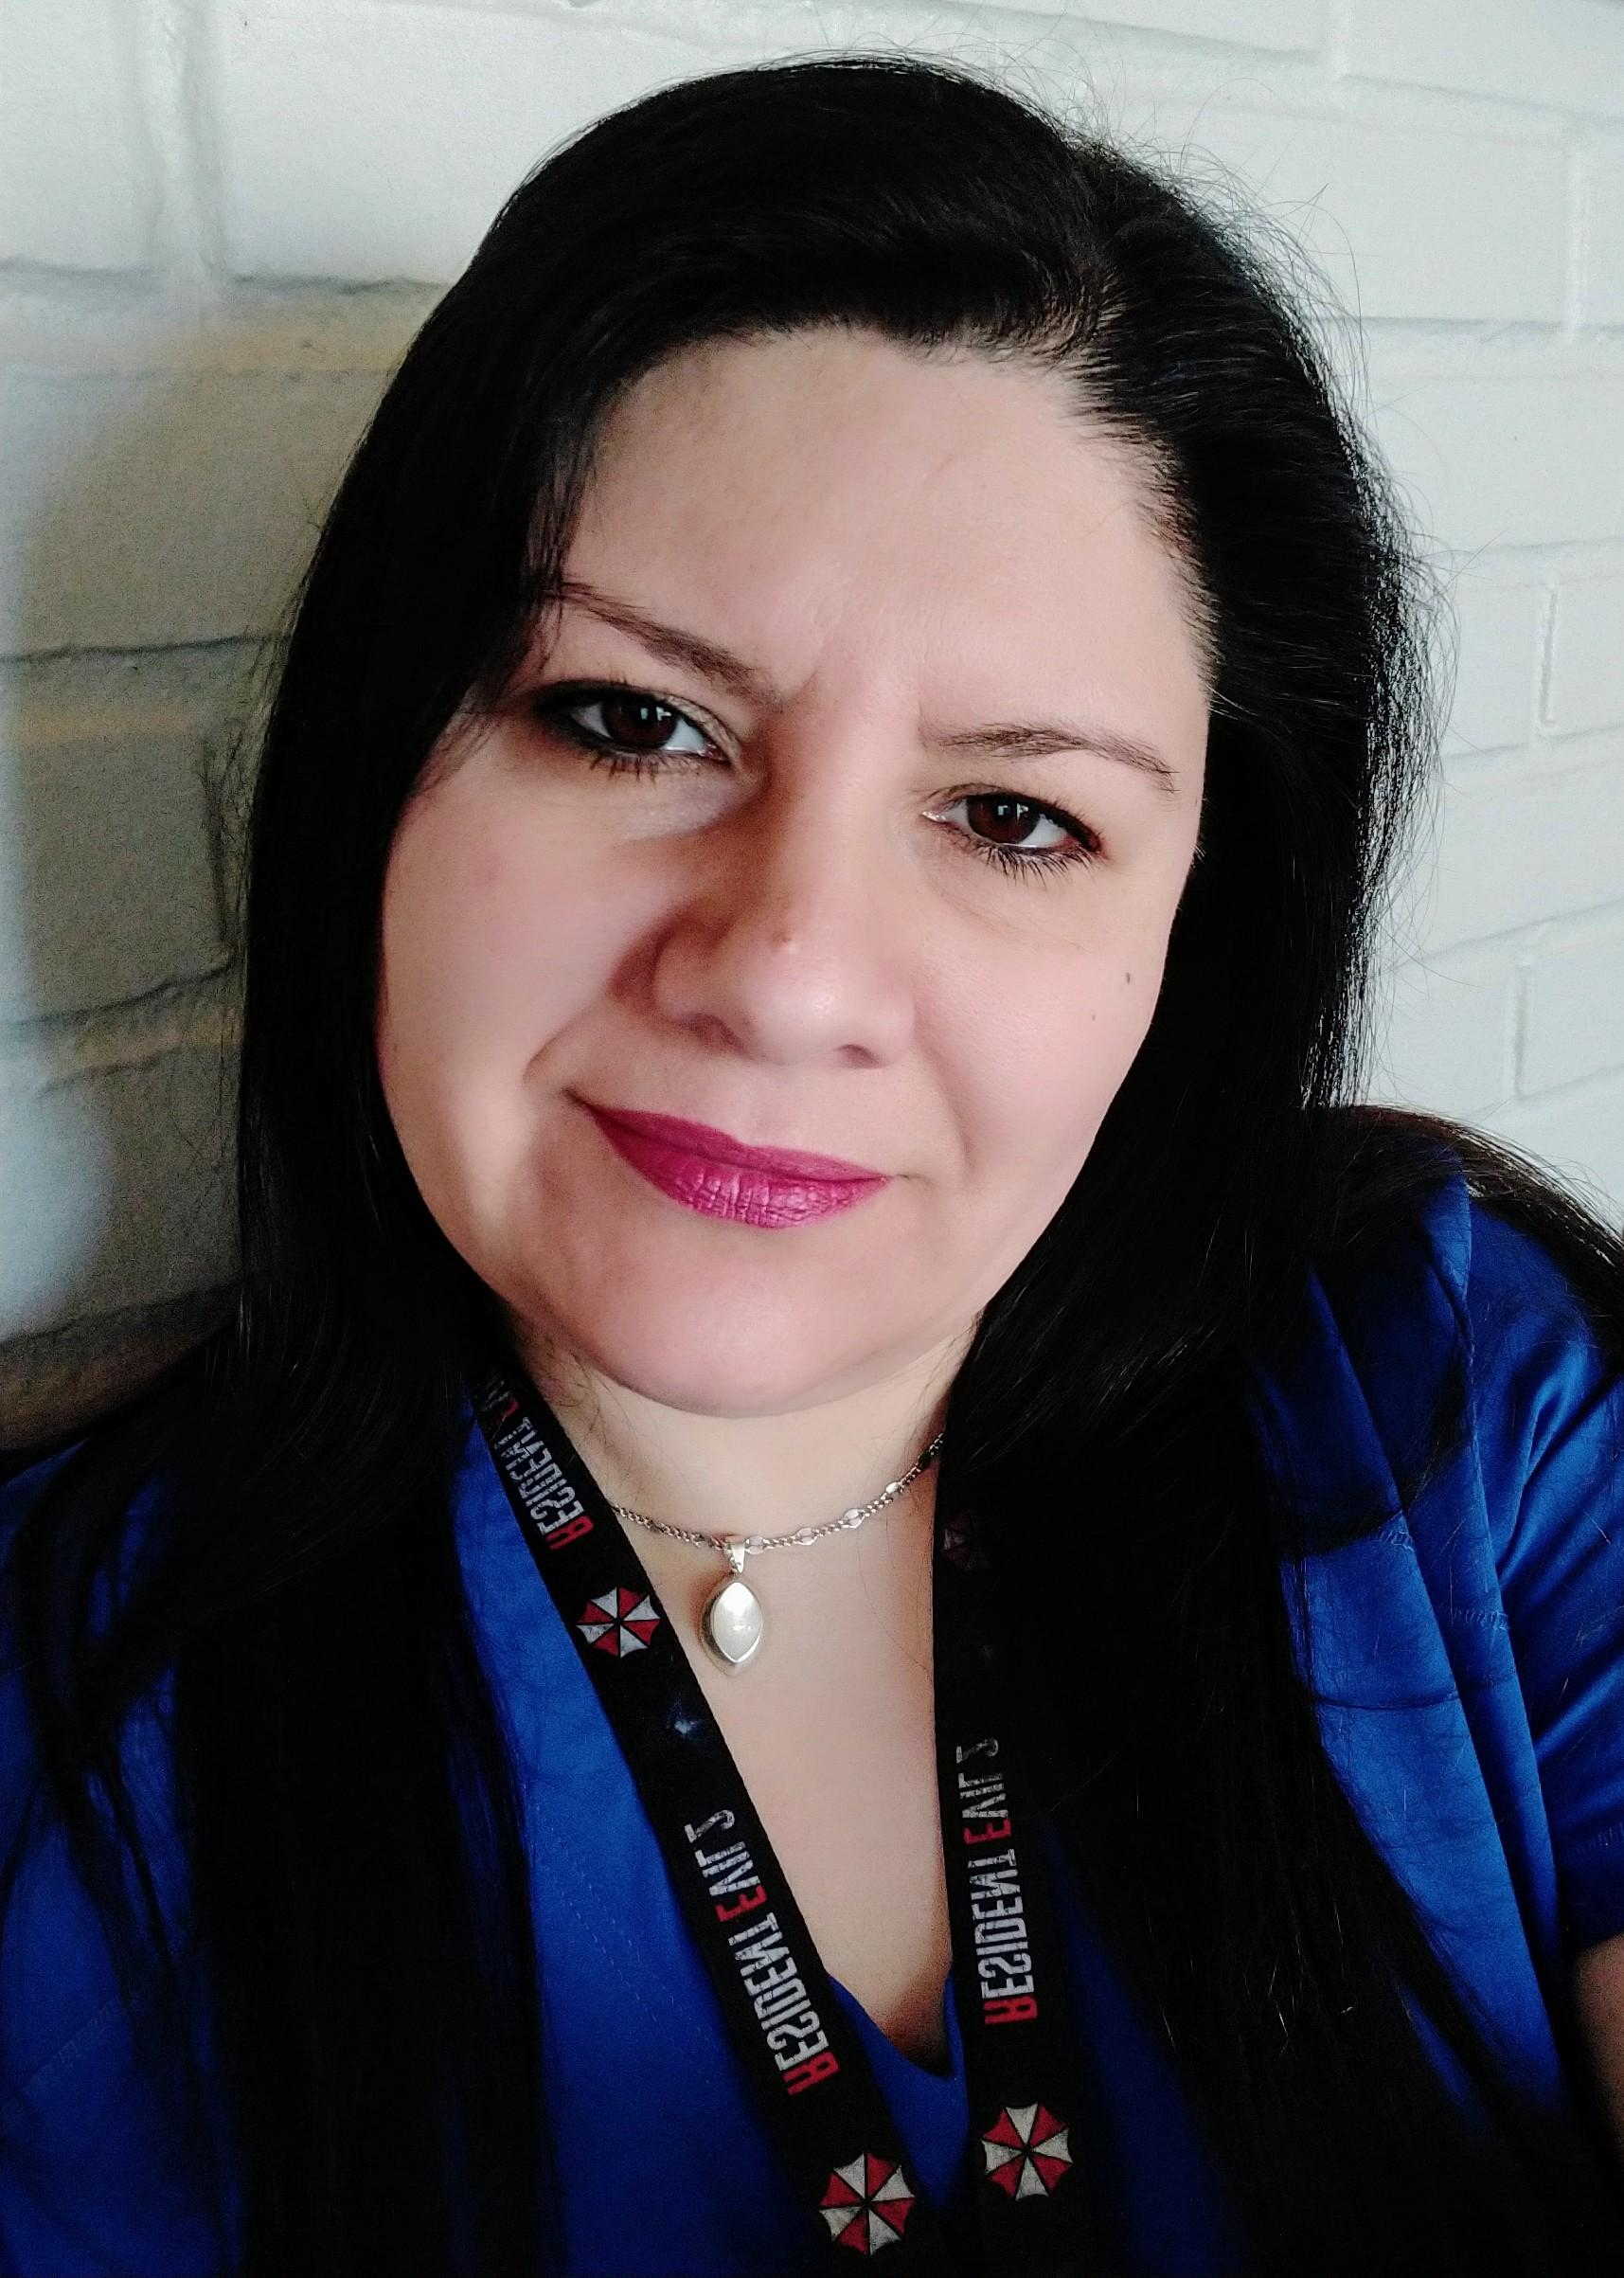 Anita Maria Aravena Moran